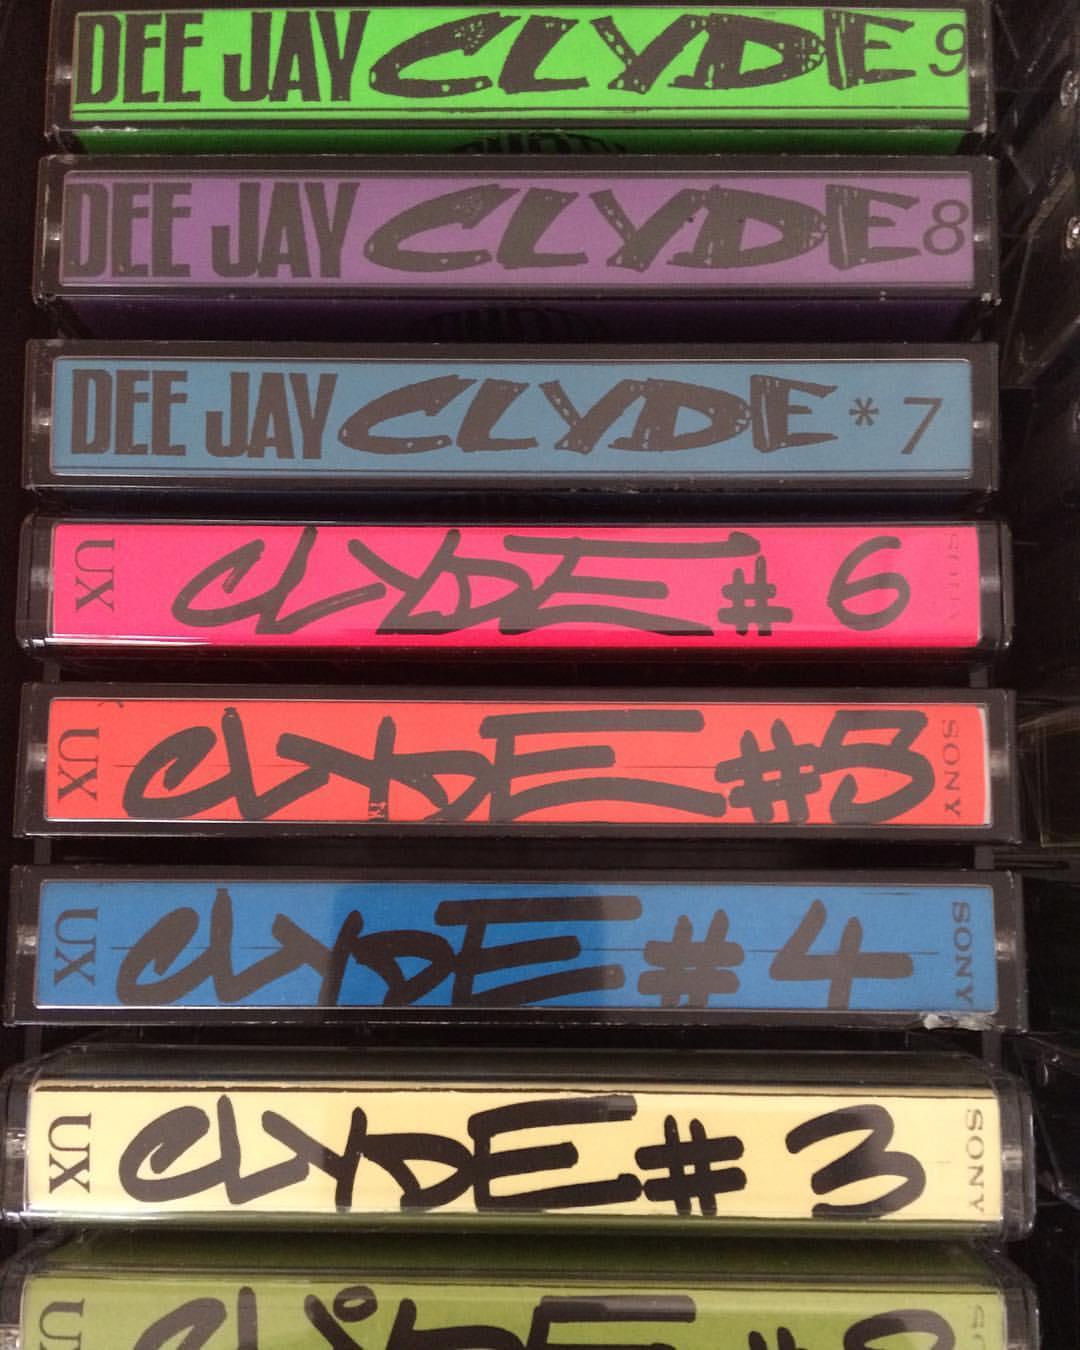 HipHop-TheGoldenEra: Hypnotyk Mixtapes By DJ Clyde